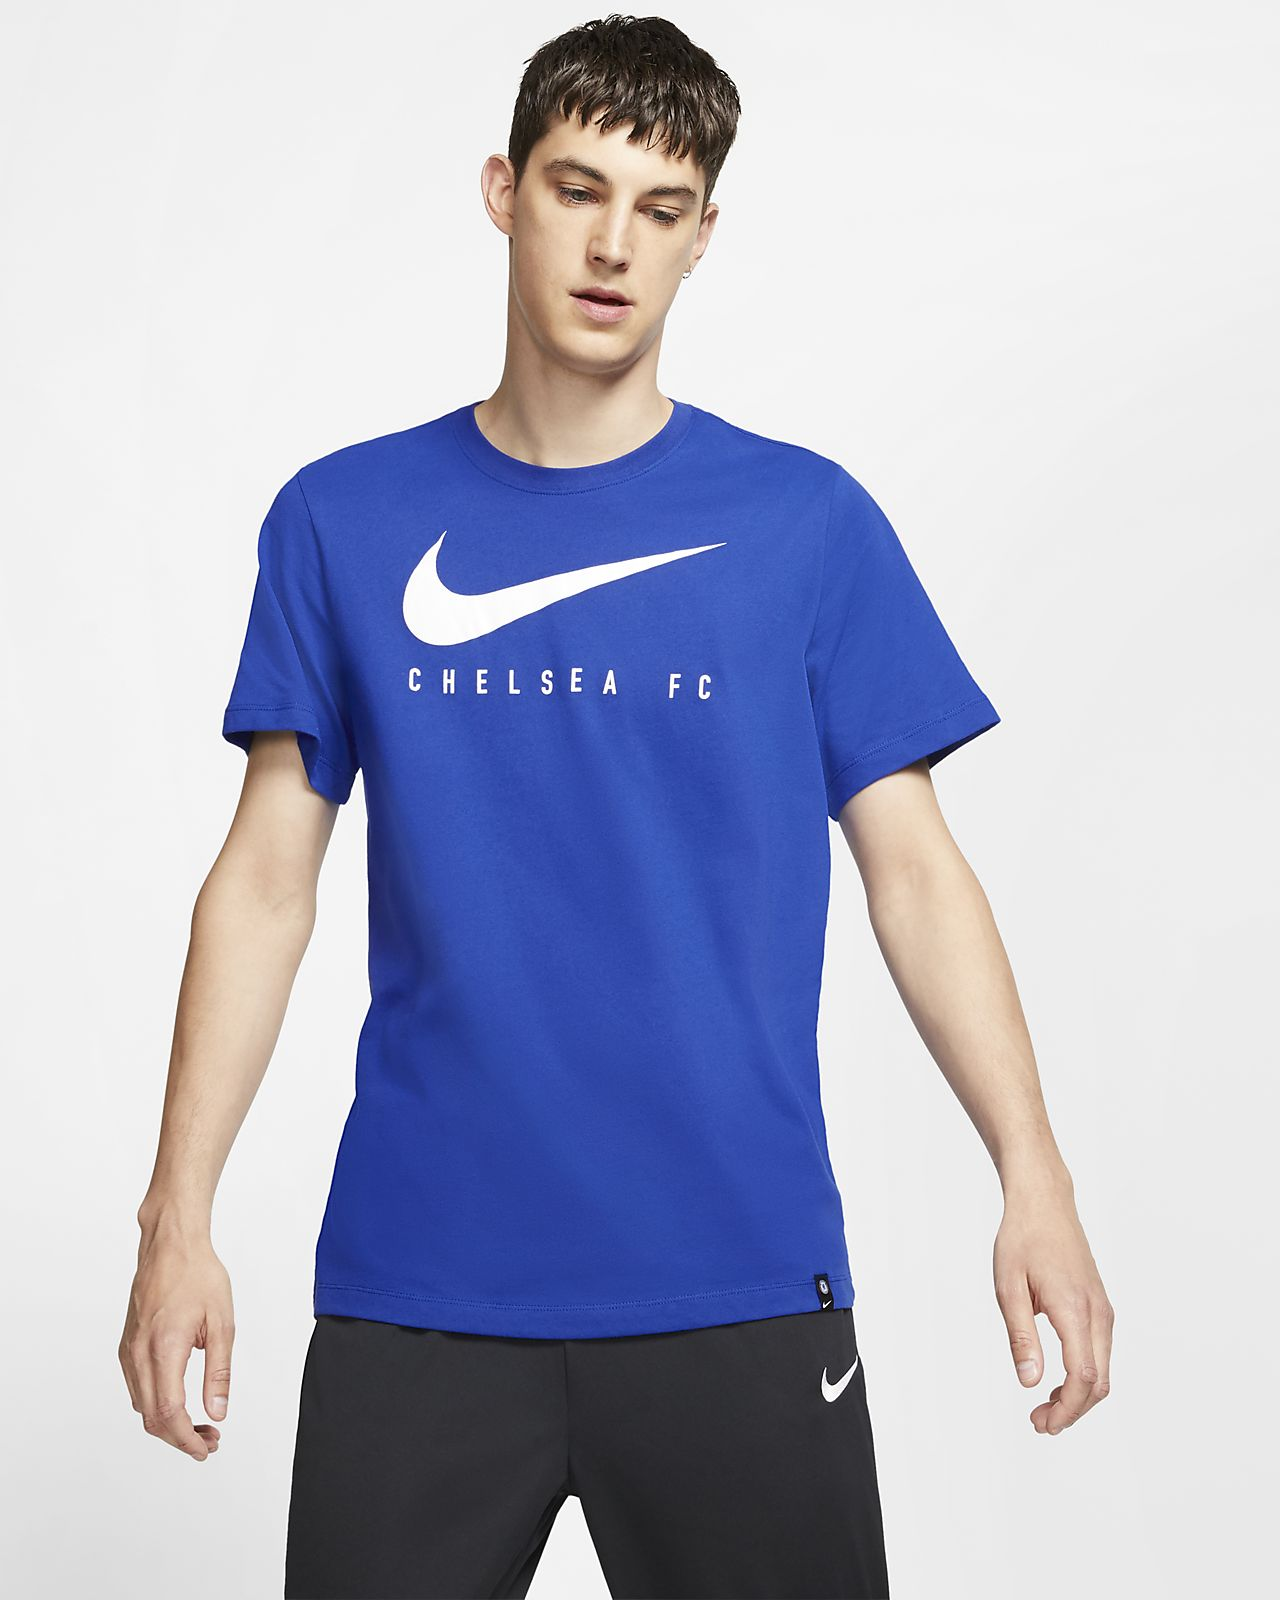 Fotbolls-t-shirt Nike Dri-FIT Chelsea FC för män